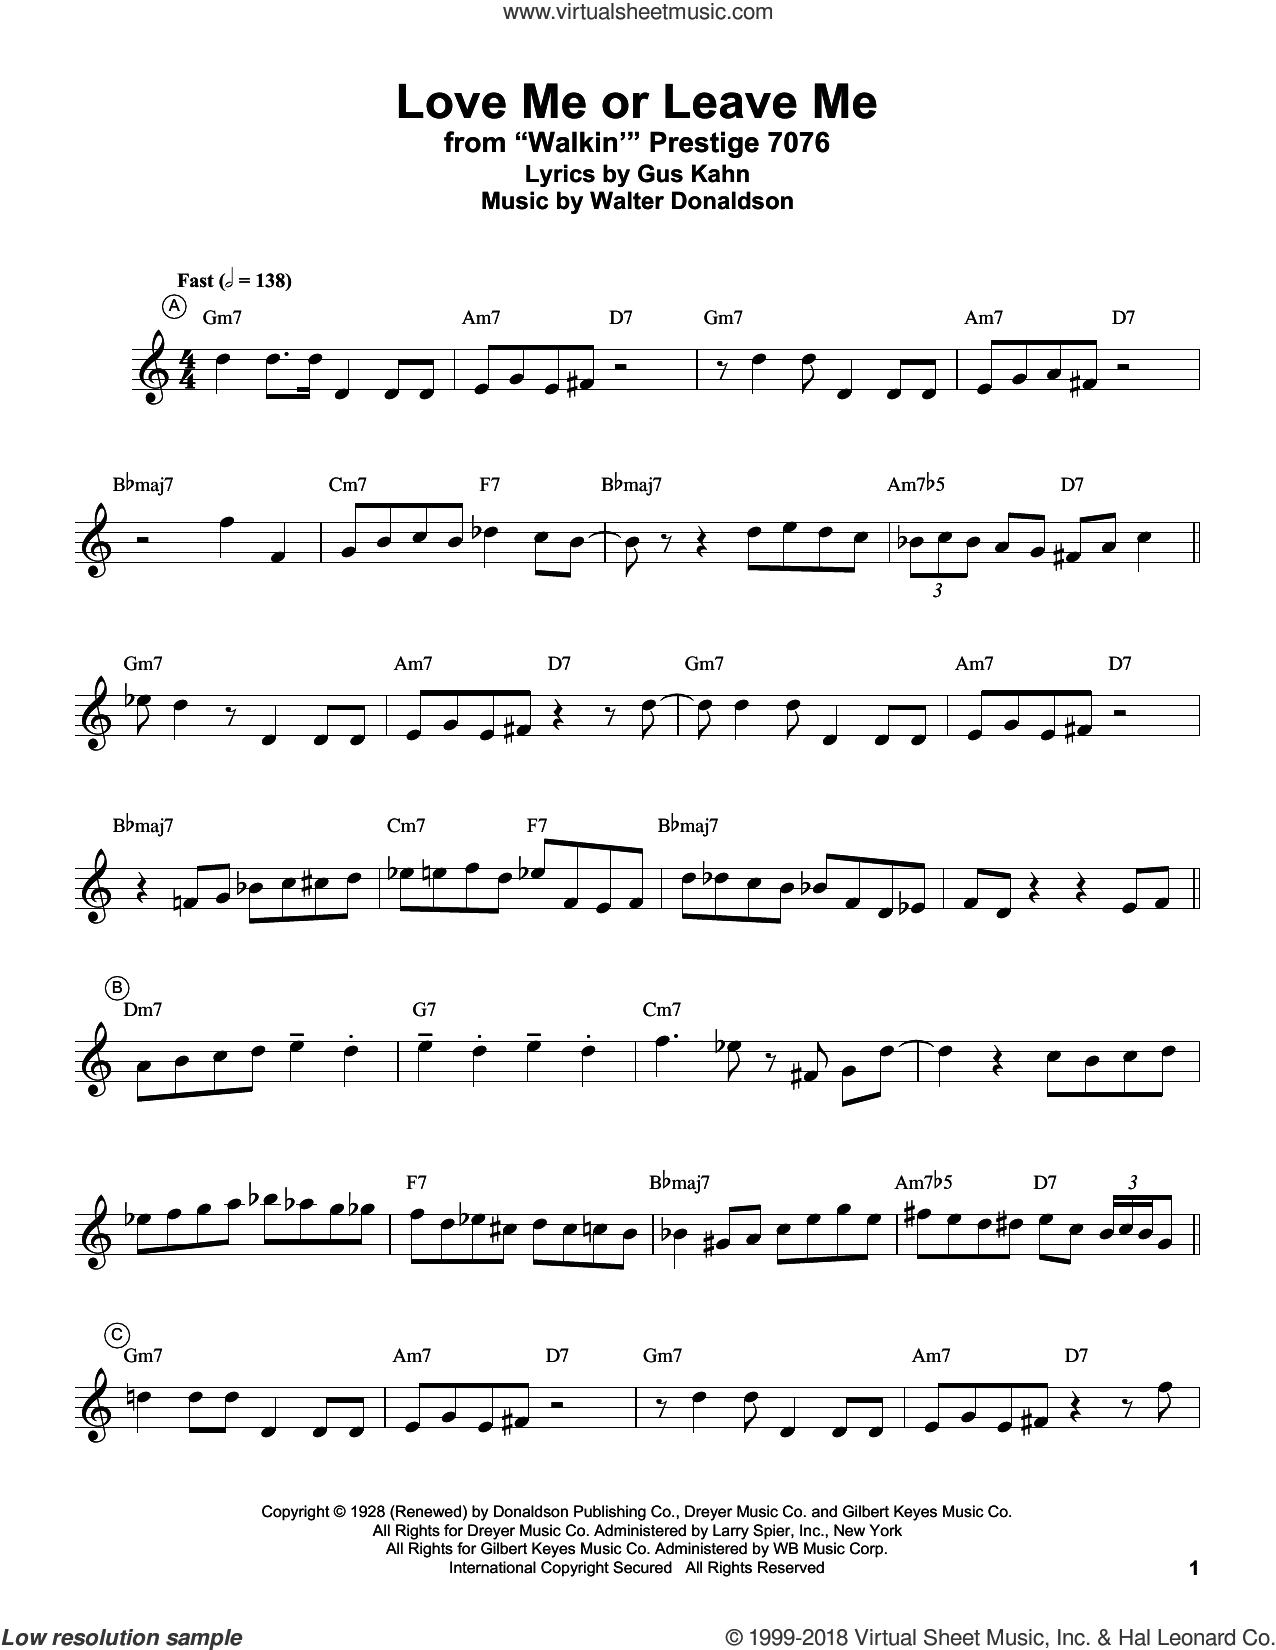 Love Me Or Leave Me sheet music for trumpet solo (transcription) by Miles Davis, Gus Kahn and Walter Donaldson, intermediate trumpet (transcription)